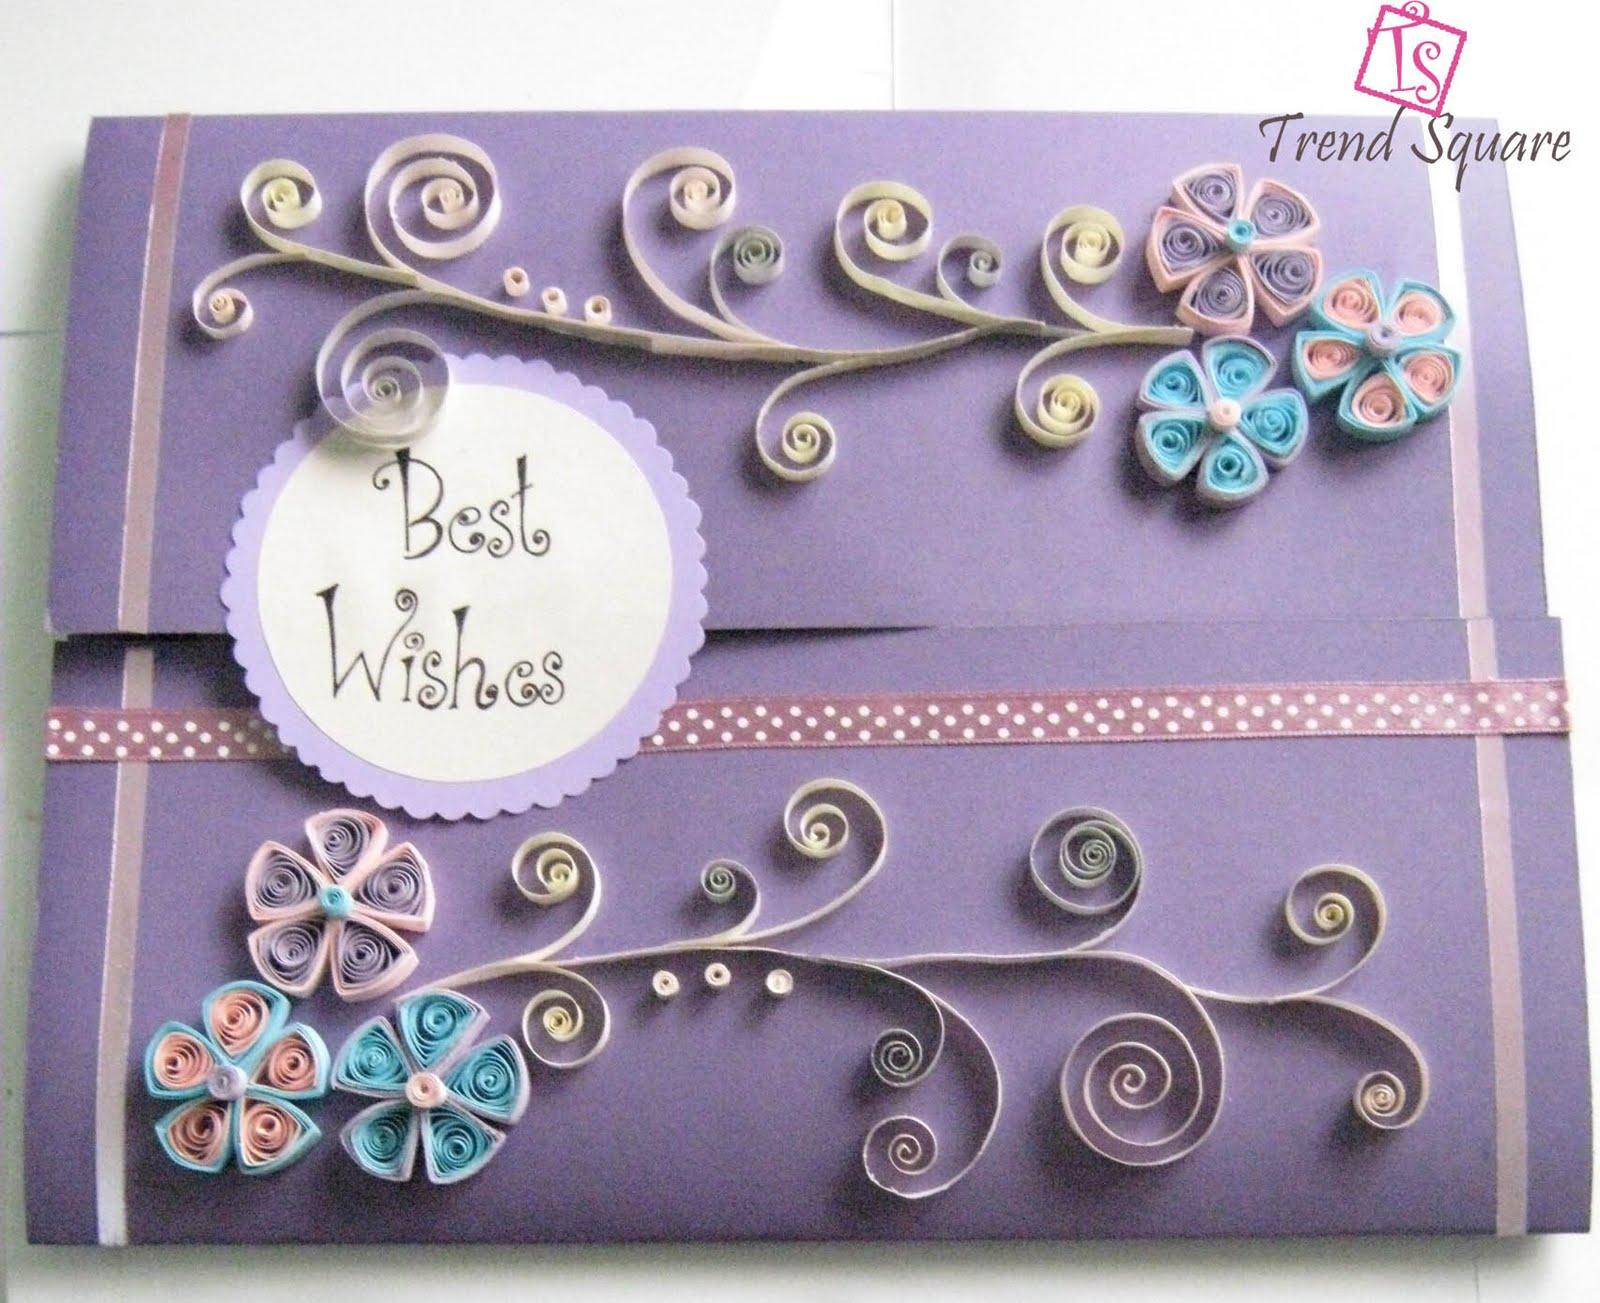 http://2.bp.blogspot.com/-Vkl4k2o5v50/TkLppENhoaI/AAAAAAAAAmE/o9GtxBU7Ku4/s1600/Big_Best_Wishes_Card.jpg